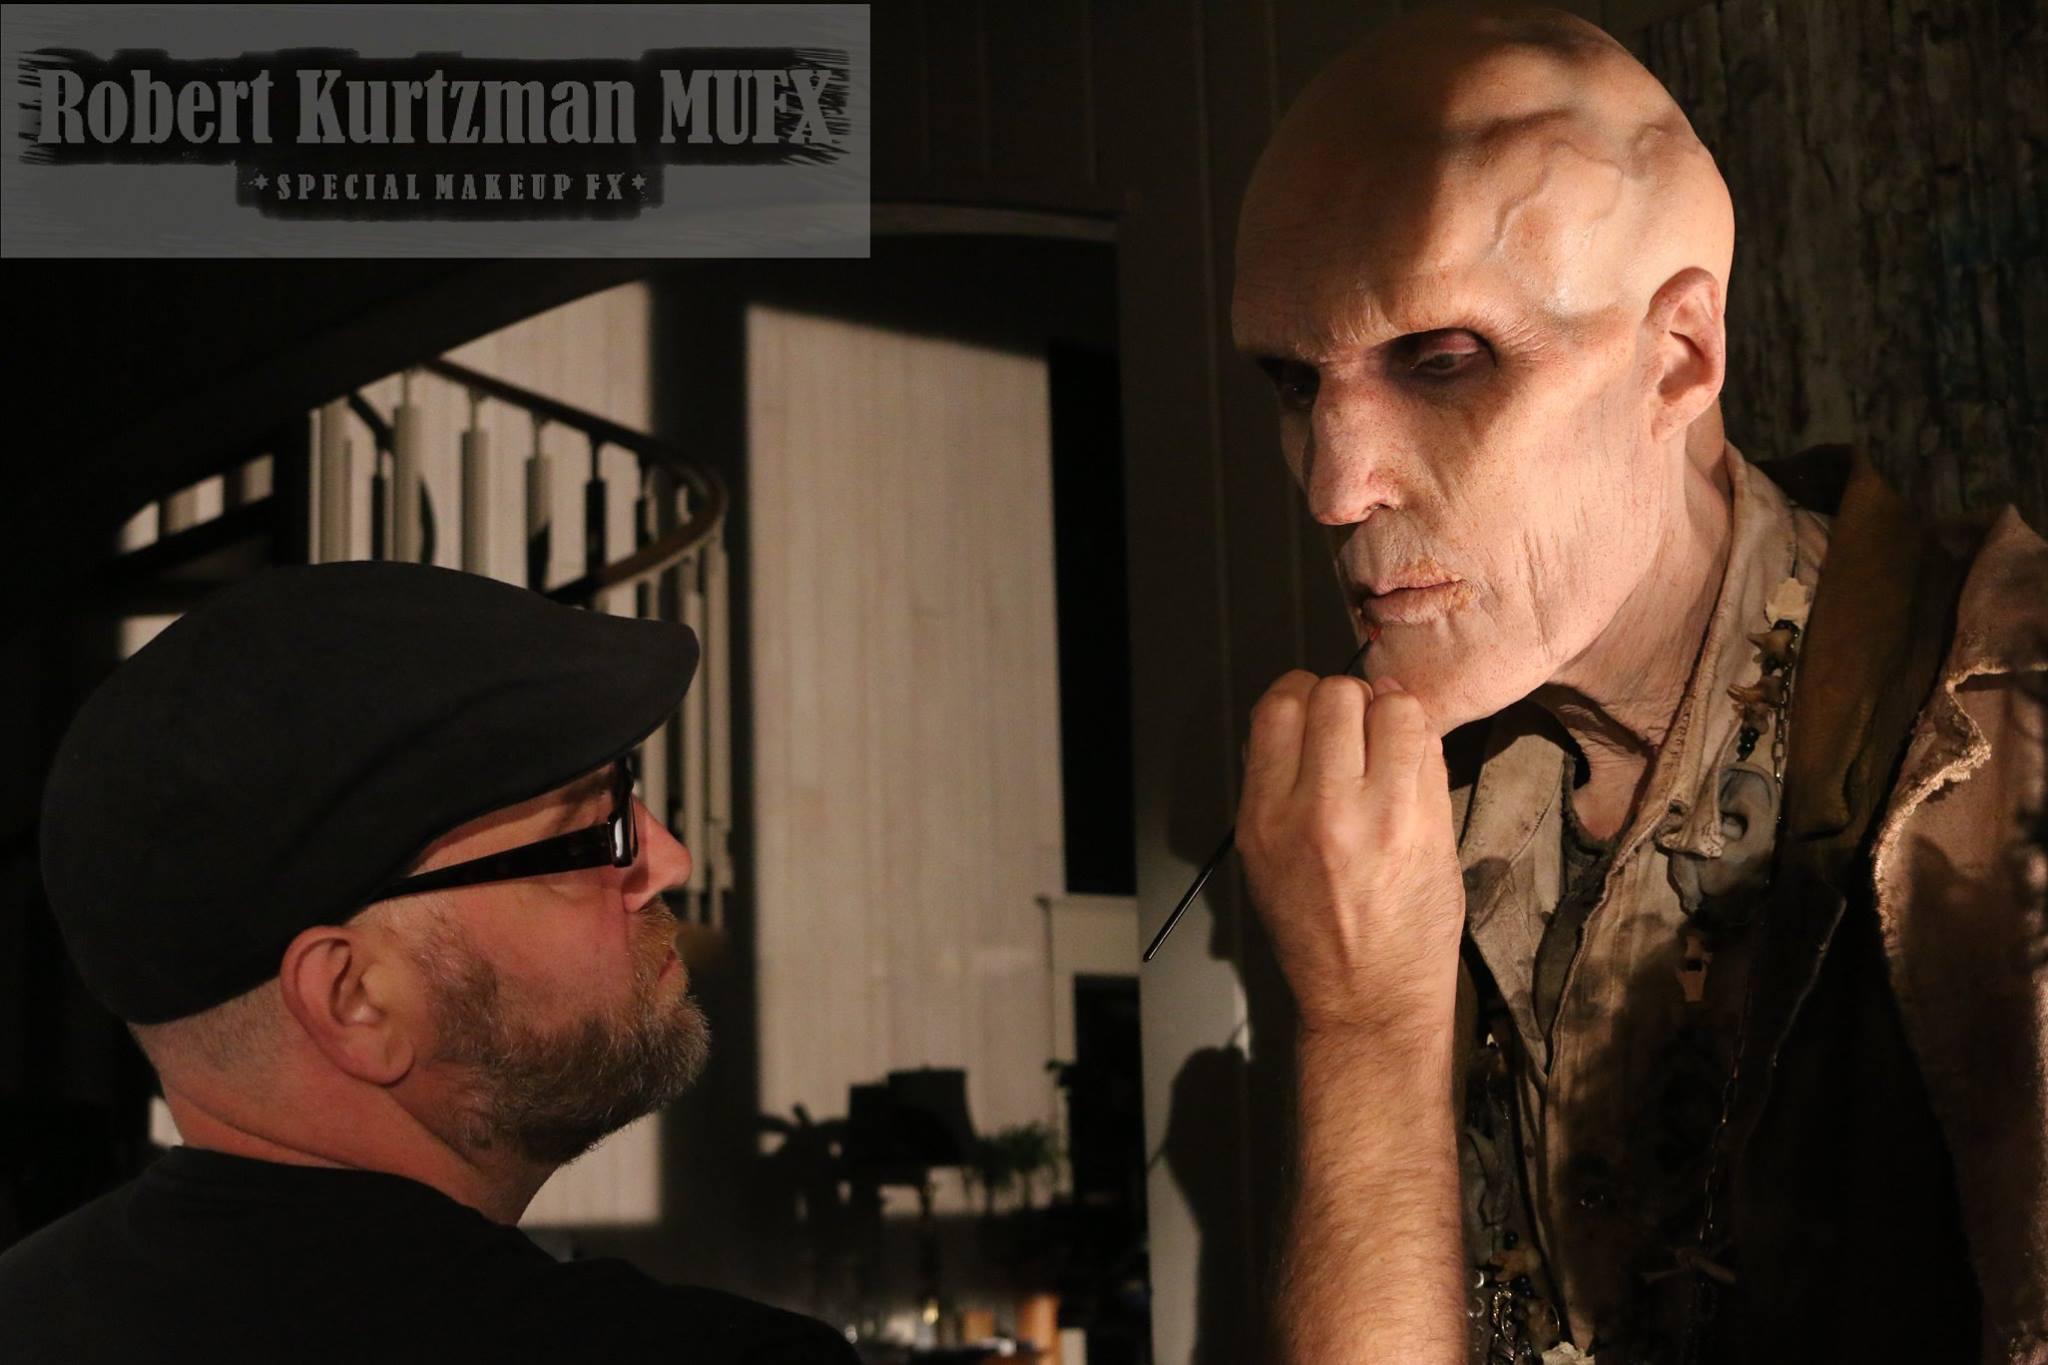 Gerald S Game Makeup Artist Shares Behind The Scenes Moonlight Man Makeup Pics Bloody Disgusting